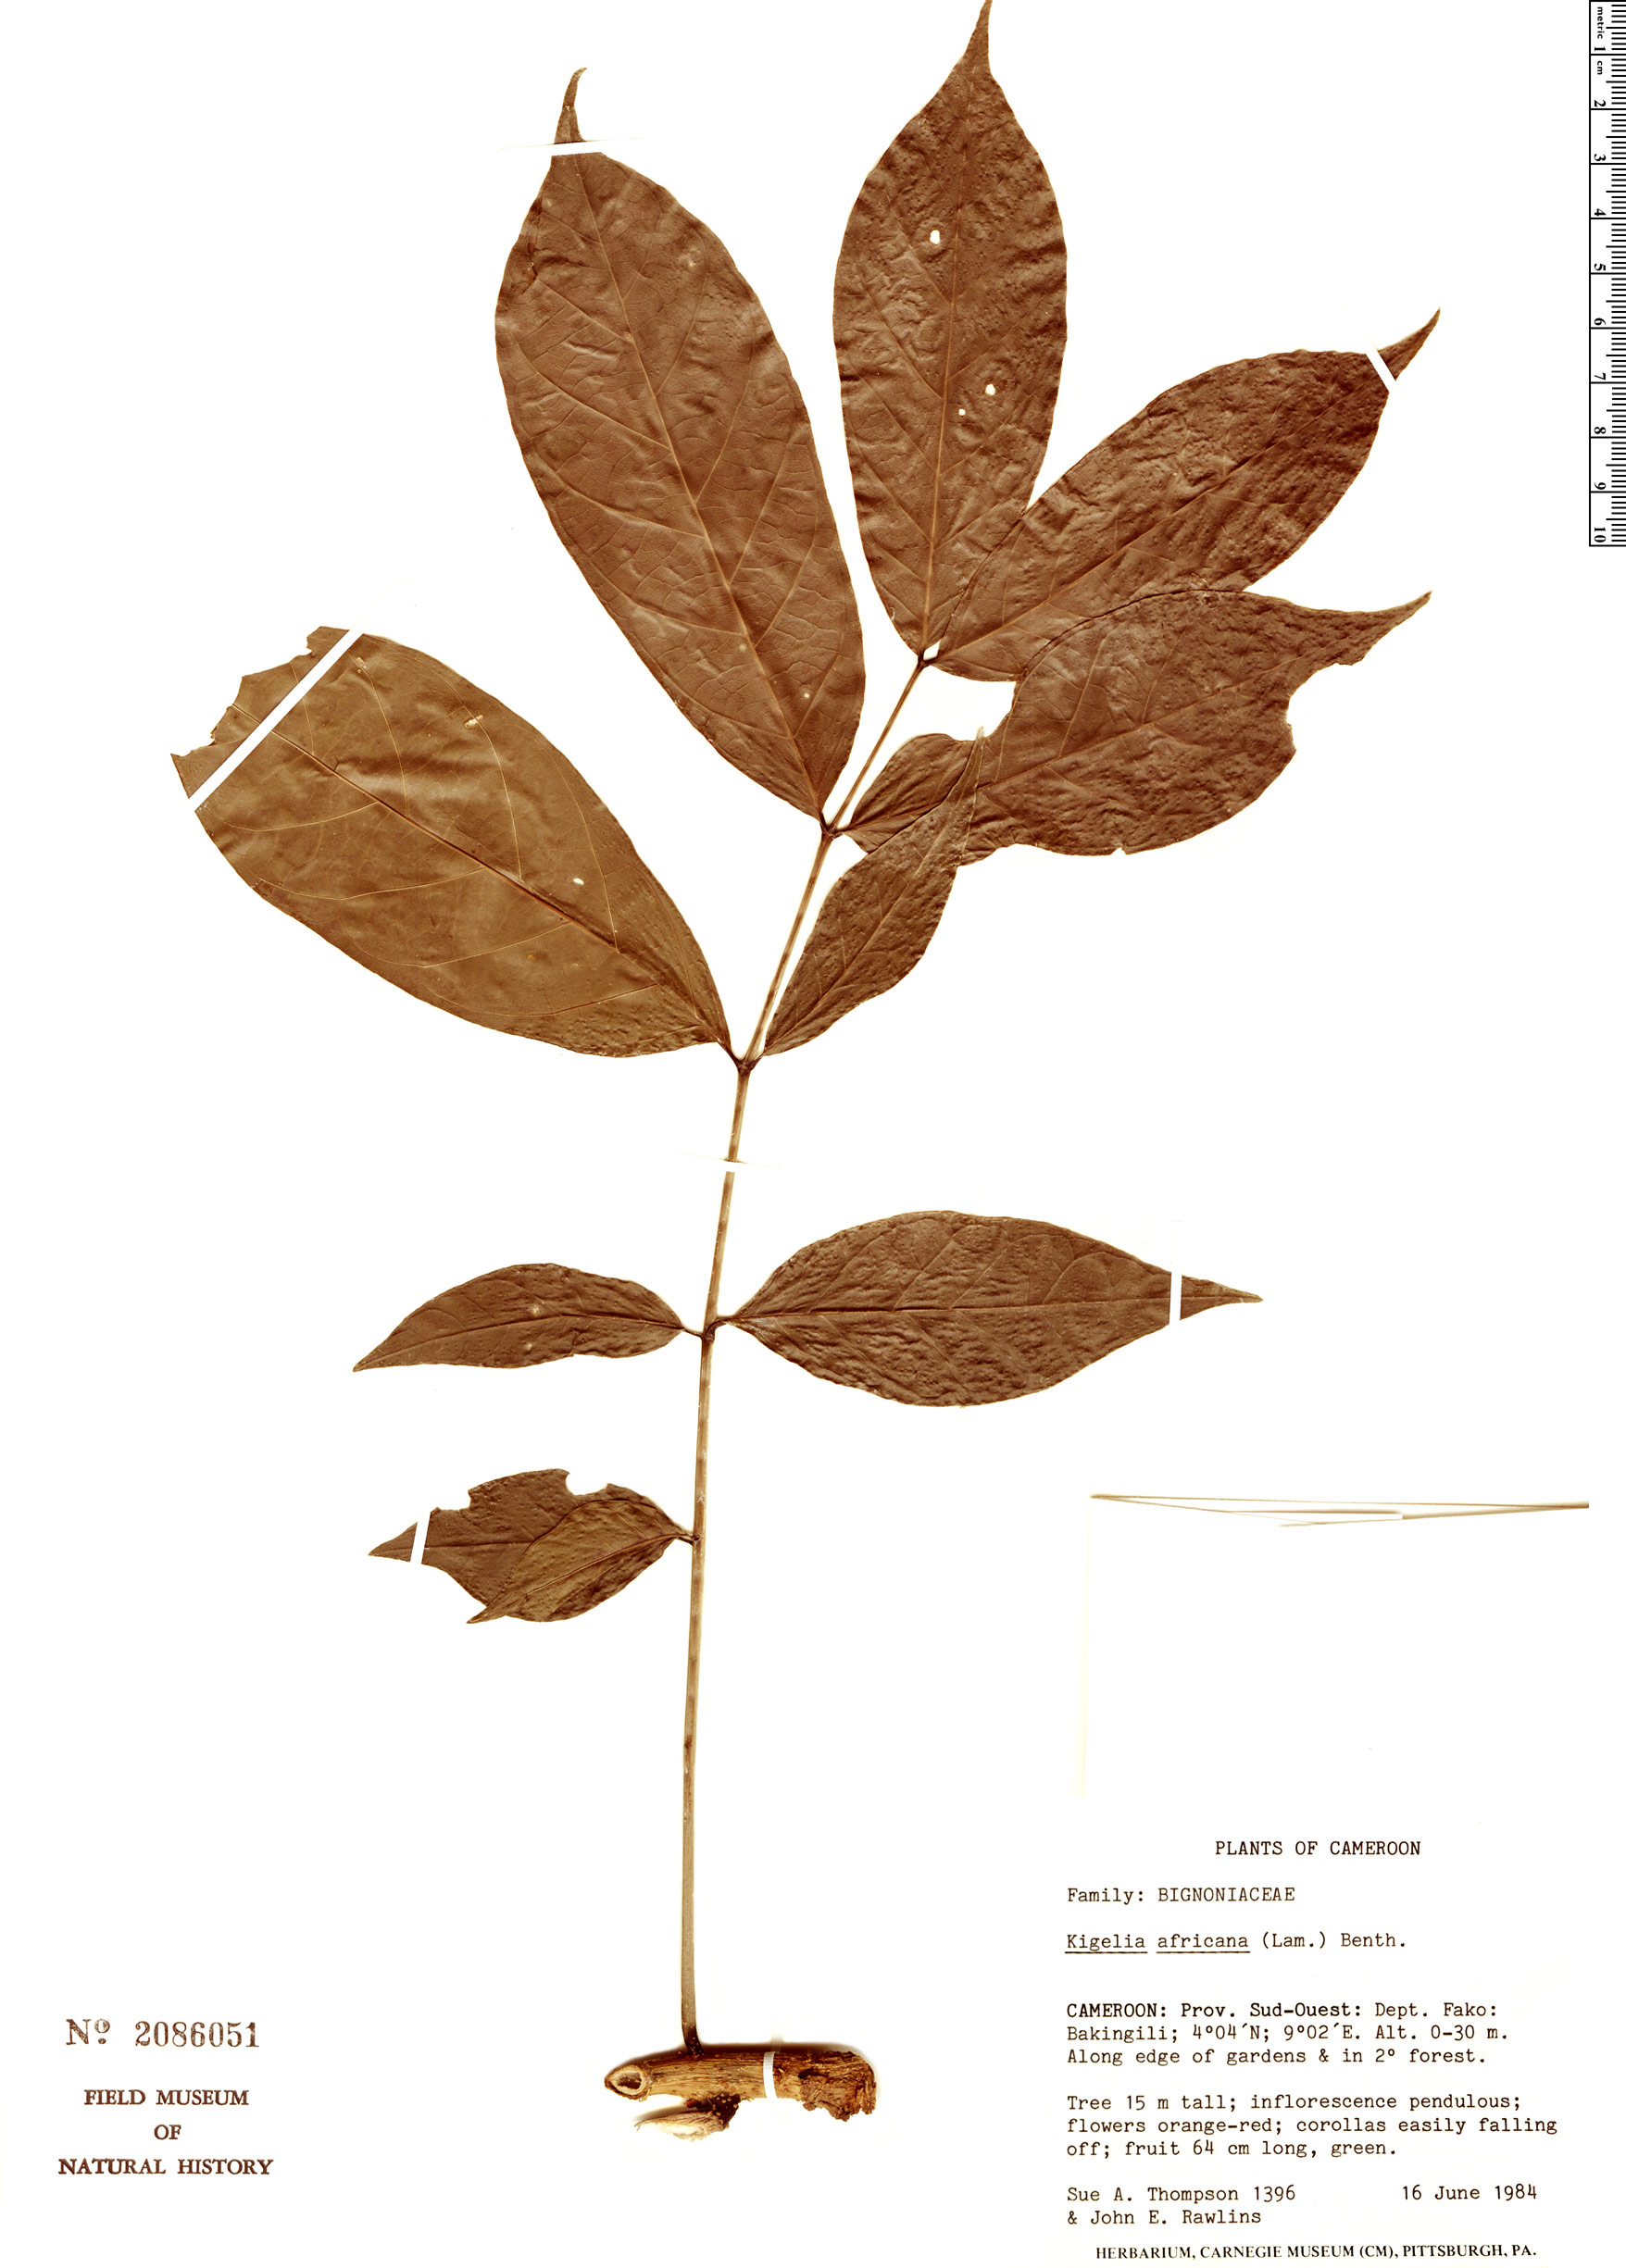 Specimen: Kigelia africana